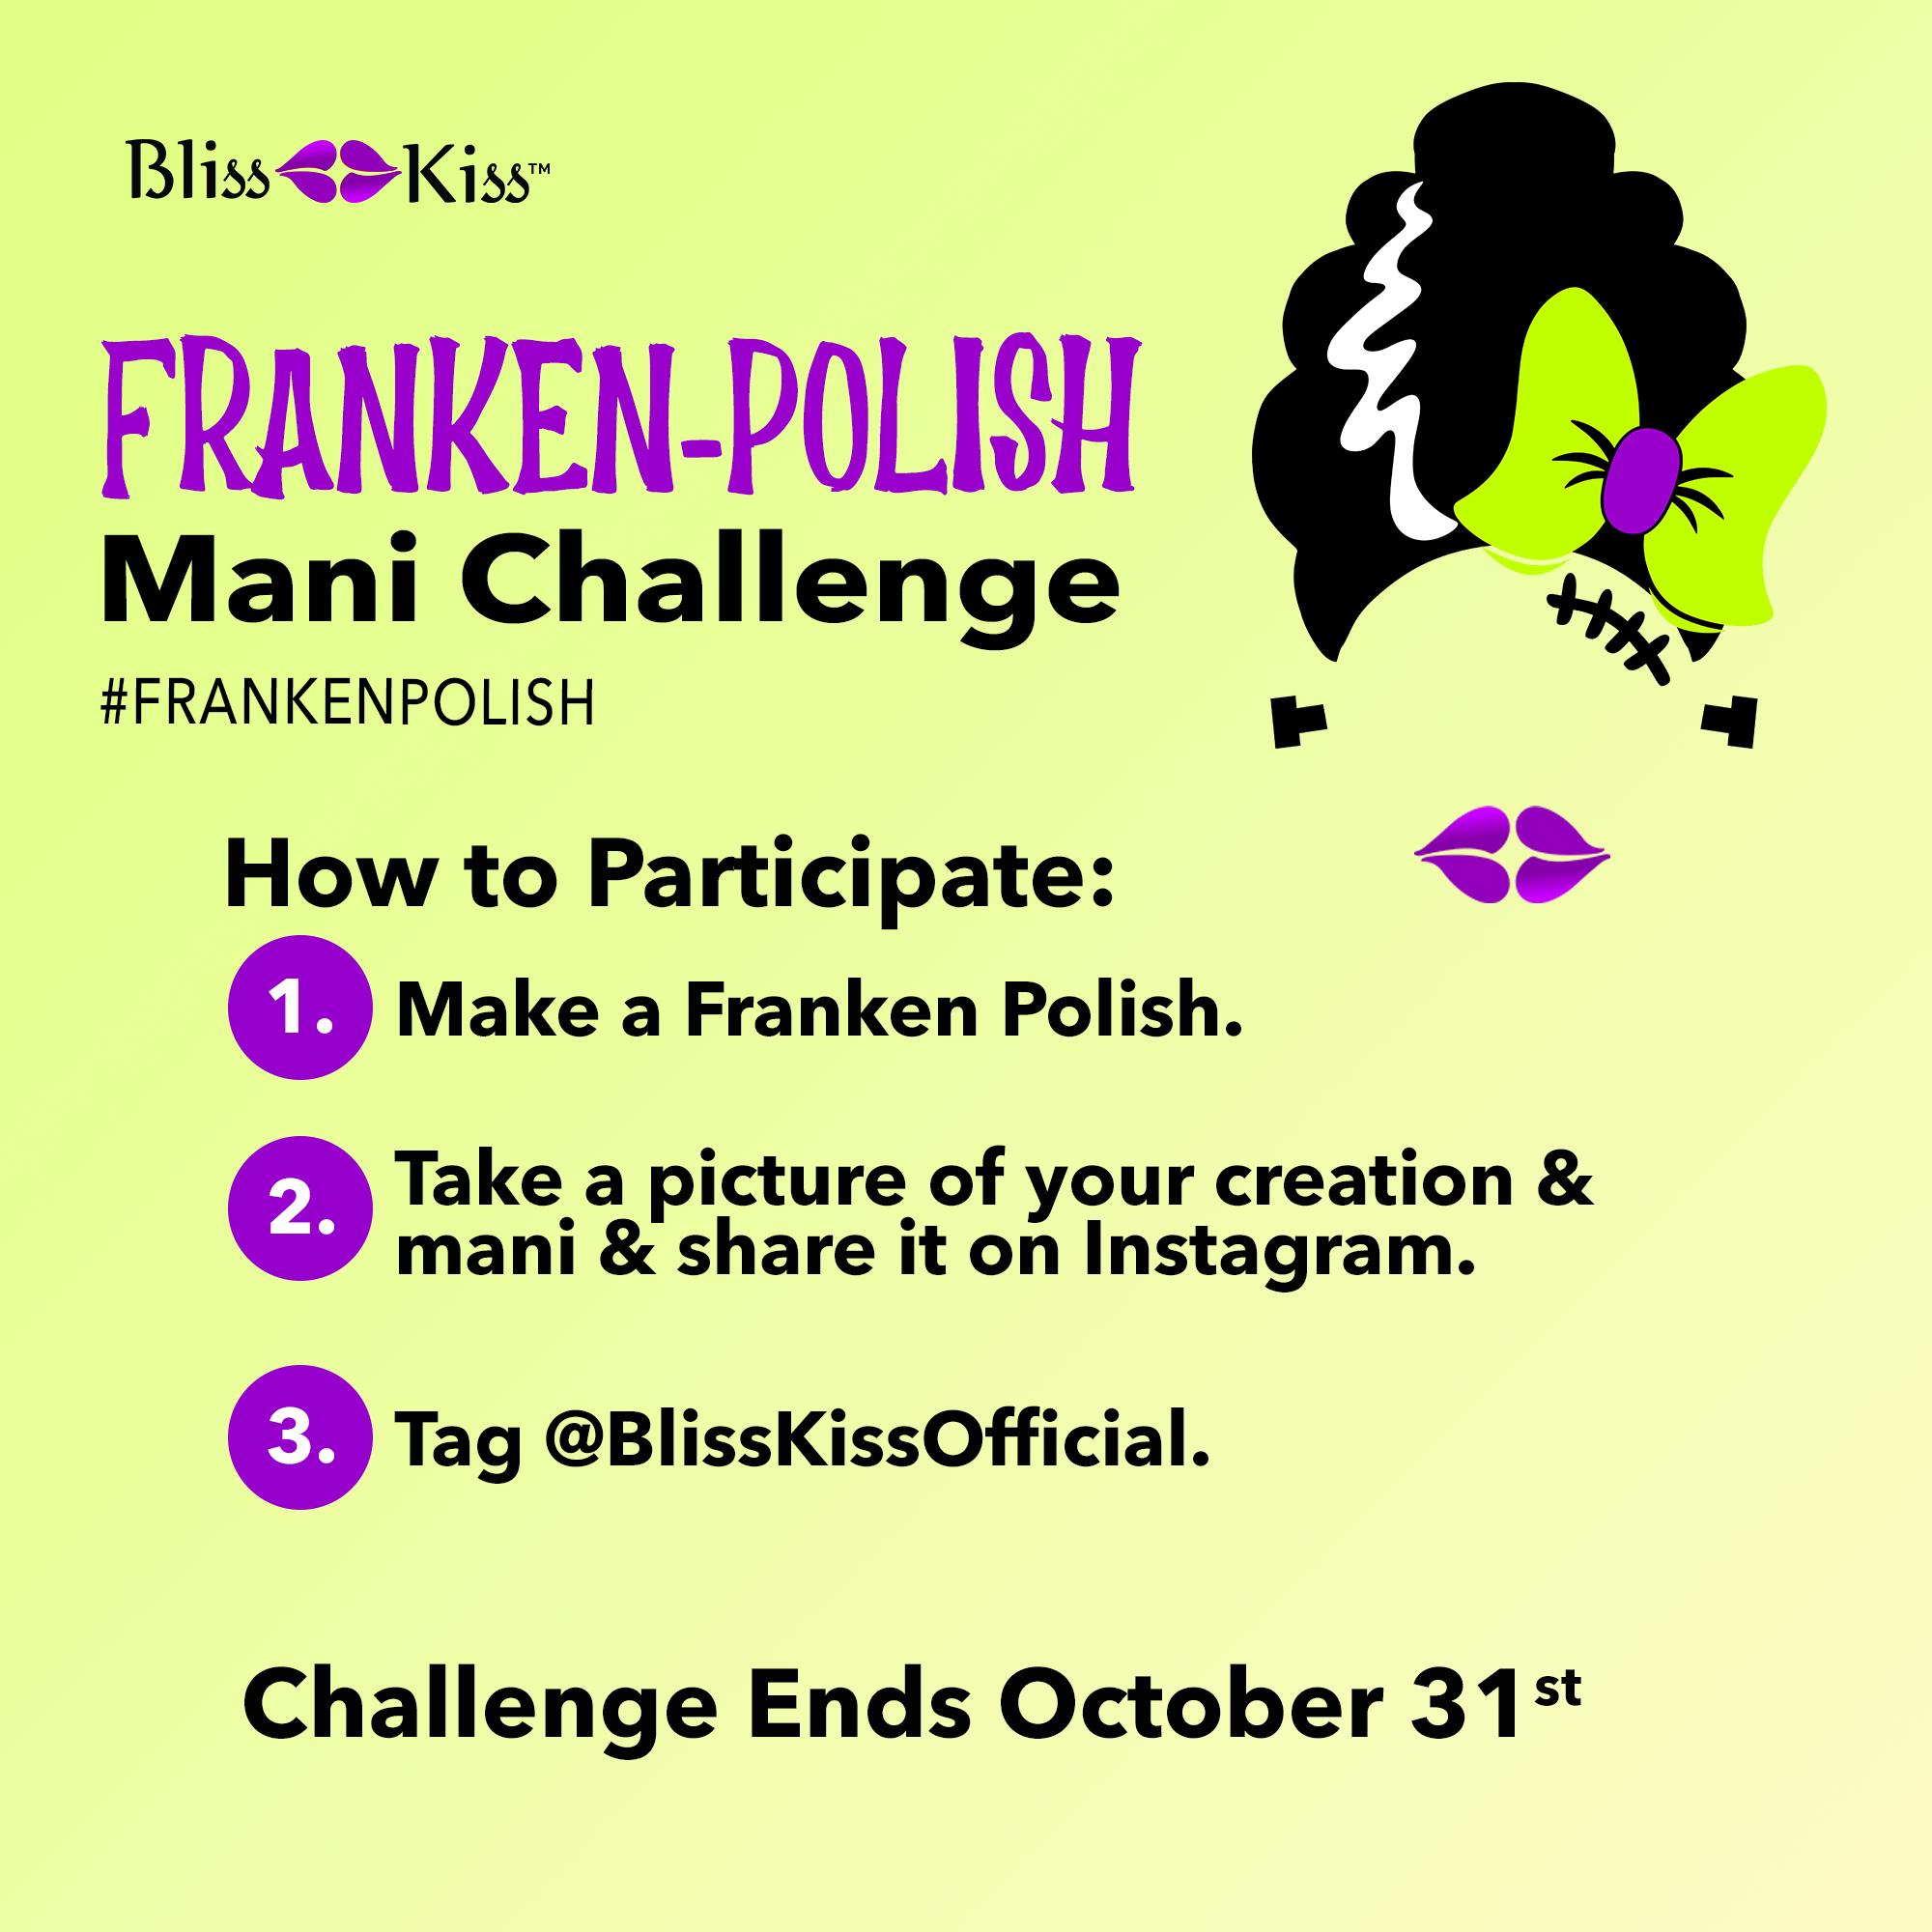 Take the Franken Polish Mani Challenge